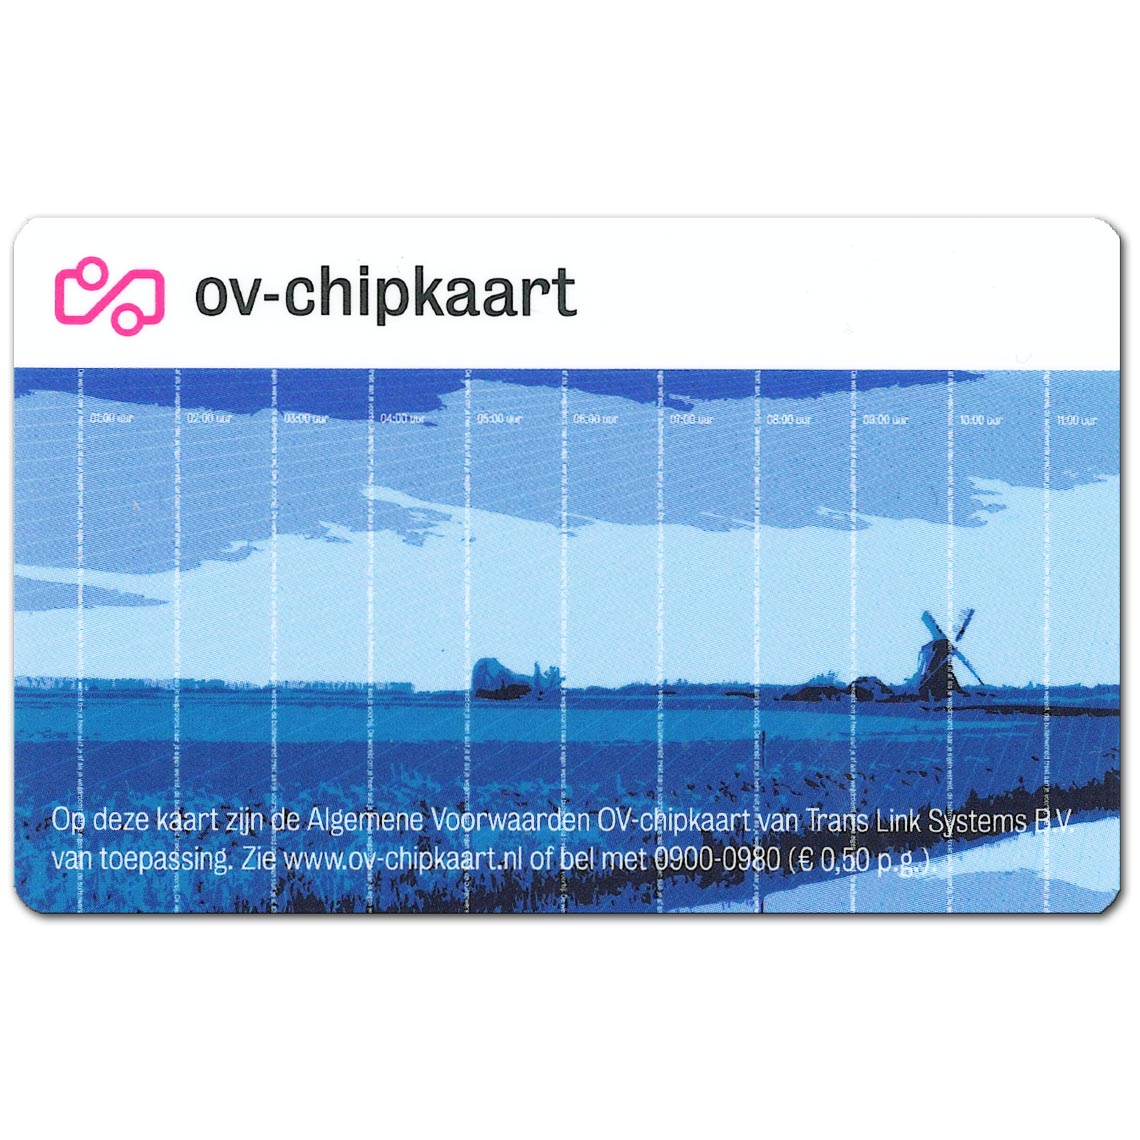 OV-chipkaart-Anoniem-Voorkant